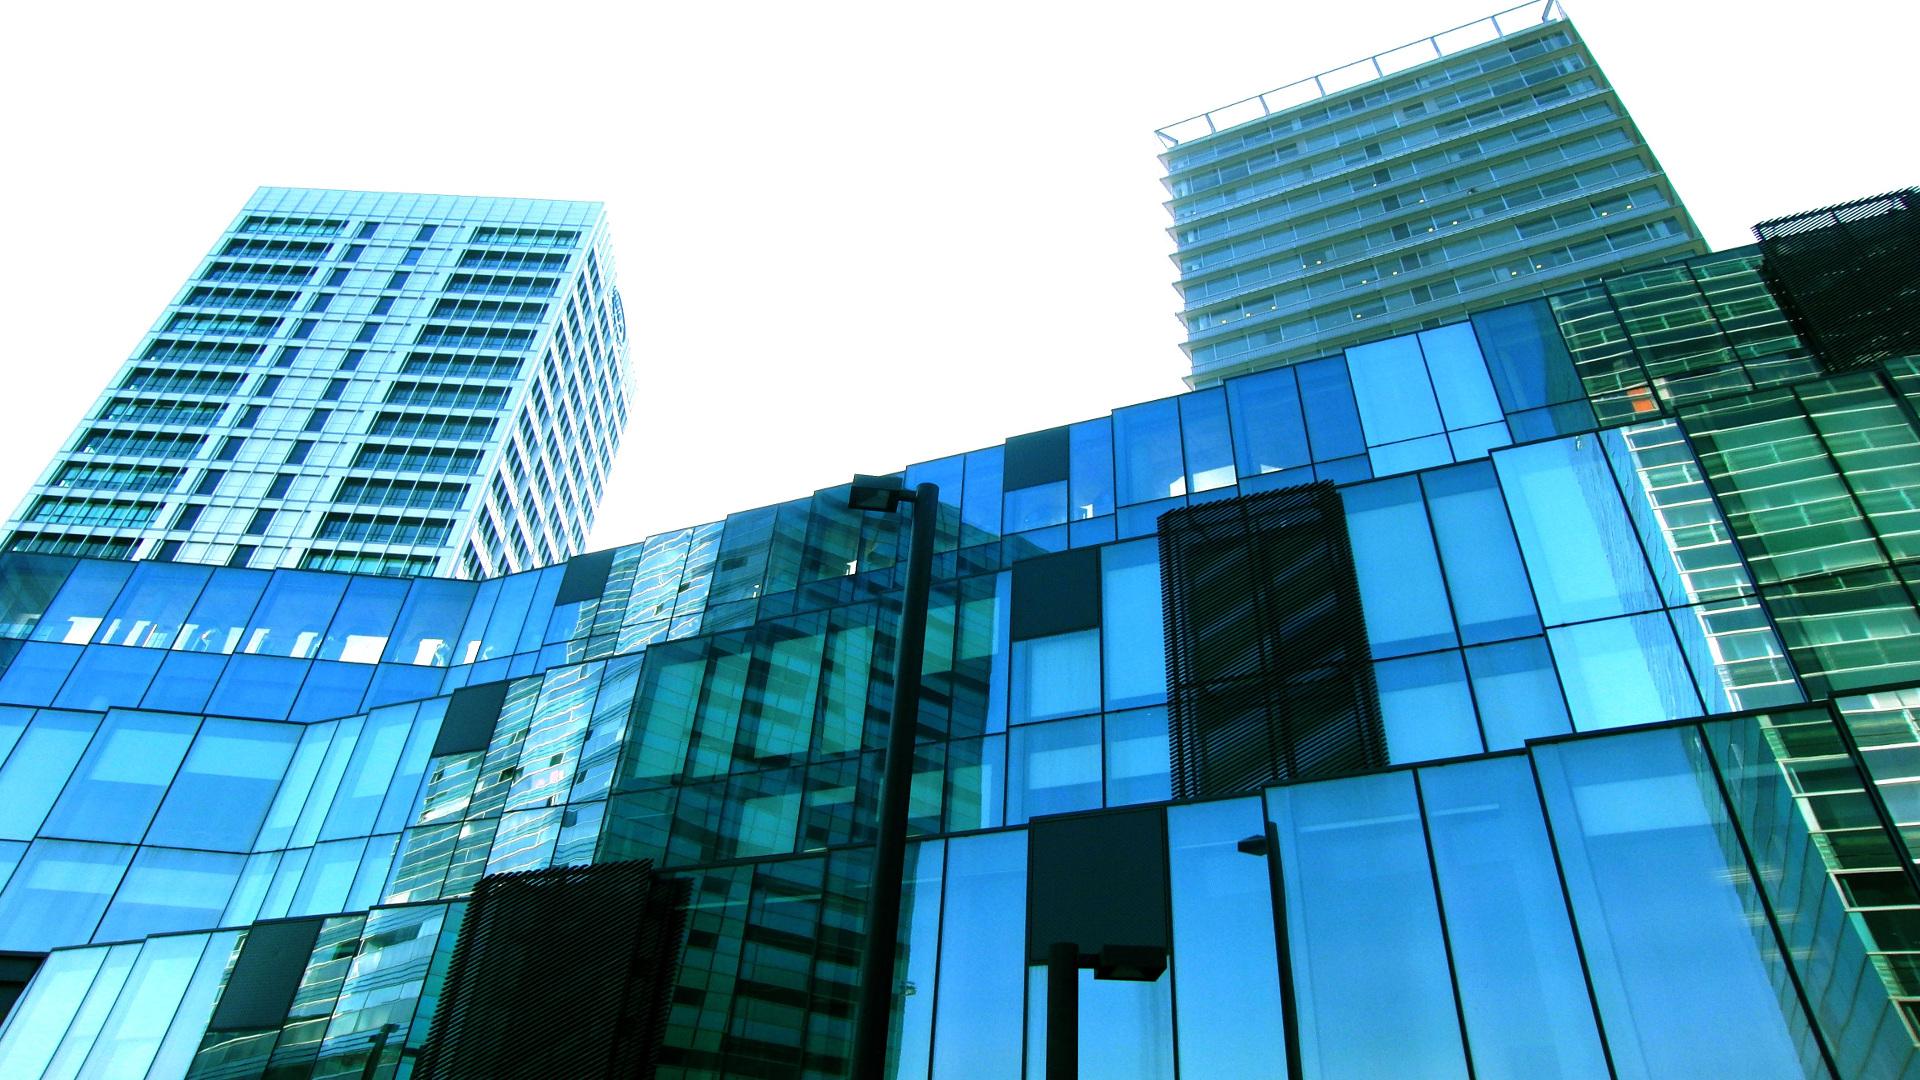 La arquitectura de cristal1920